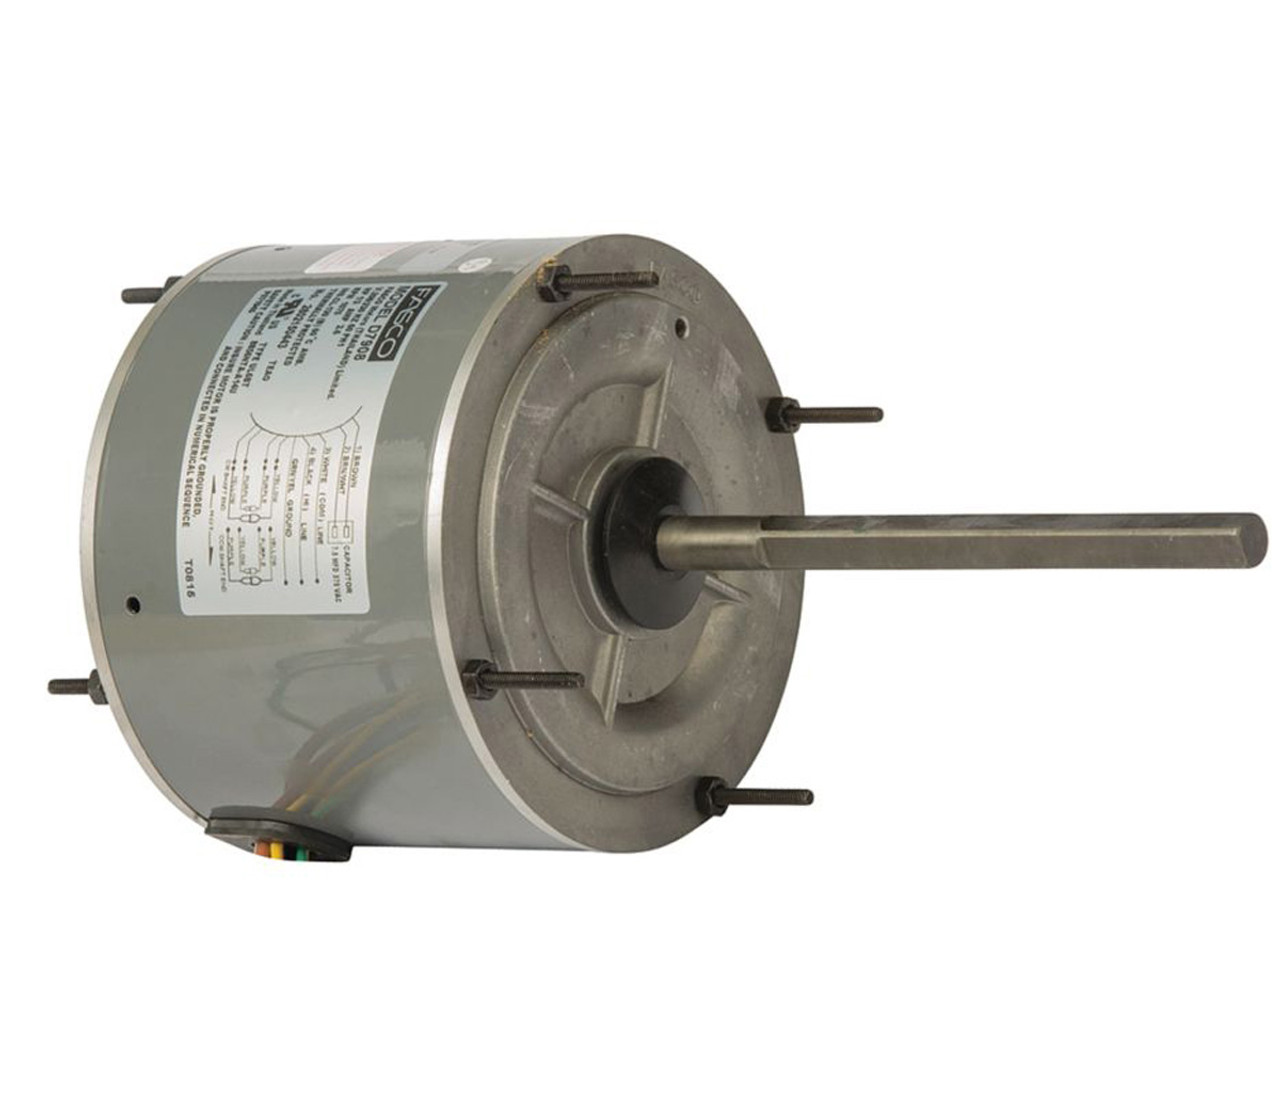 D7908 Wiring Diagram Schematic Name 1 Hp Electric Motor 3 1075 Rpm 5 6 Diameter 208 230 Volts Fasco Smart Car Diagrams